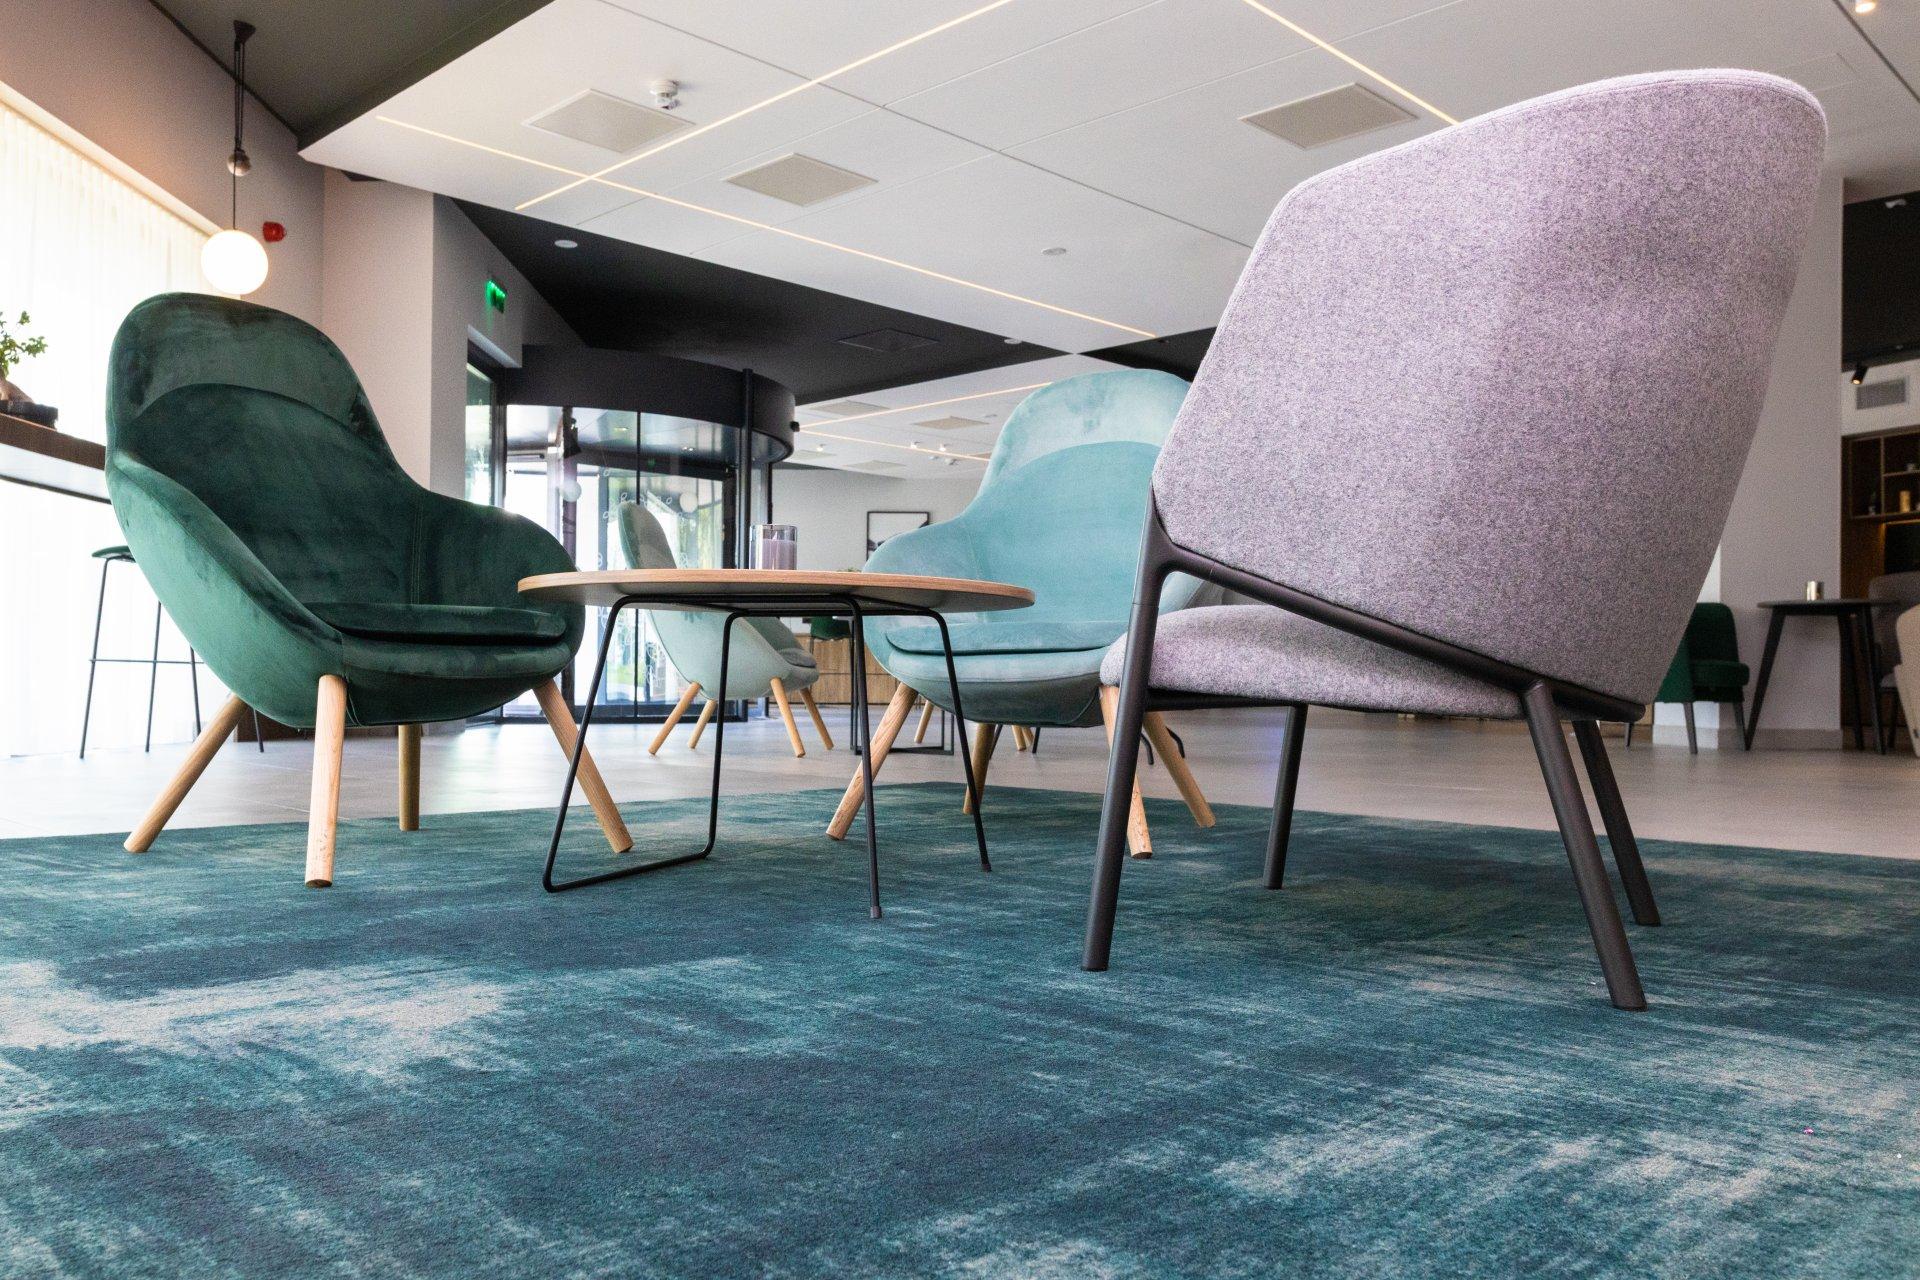 20200625-carpet-and-more-hilton-otopeni-33